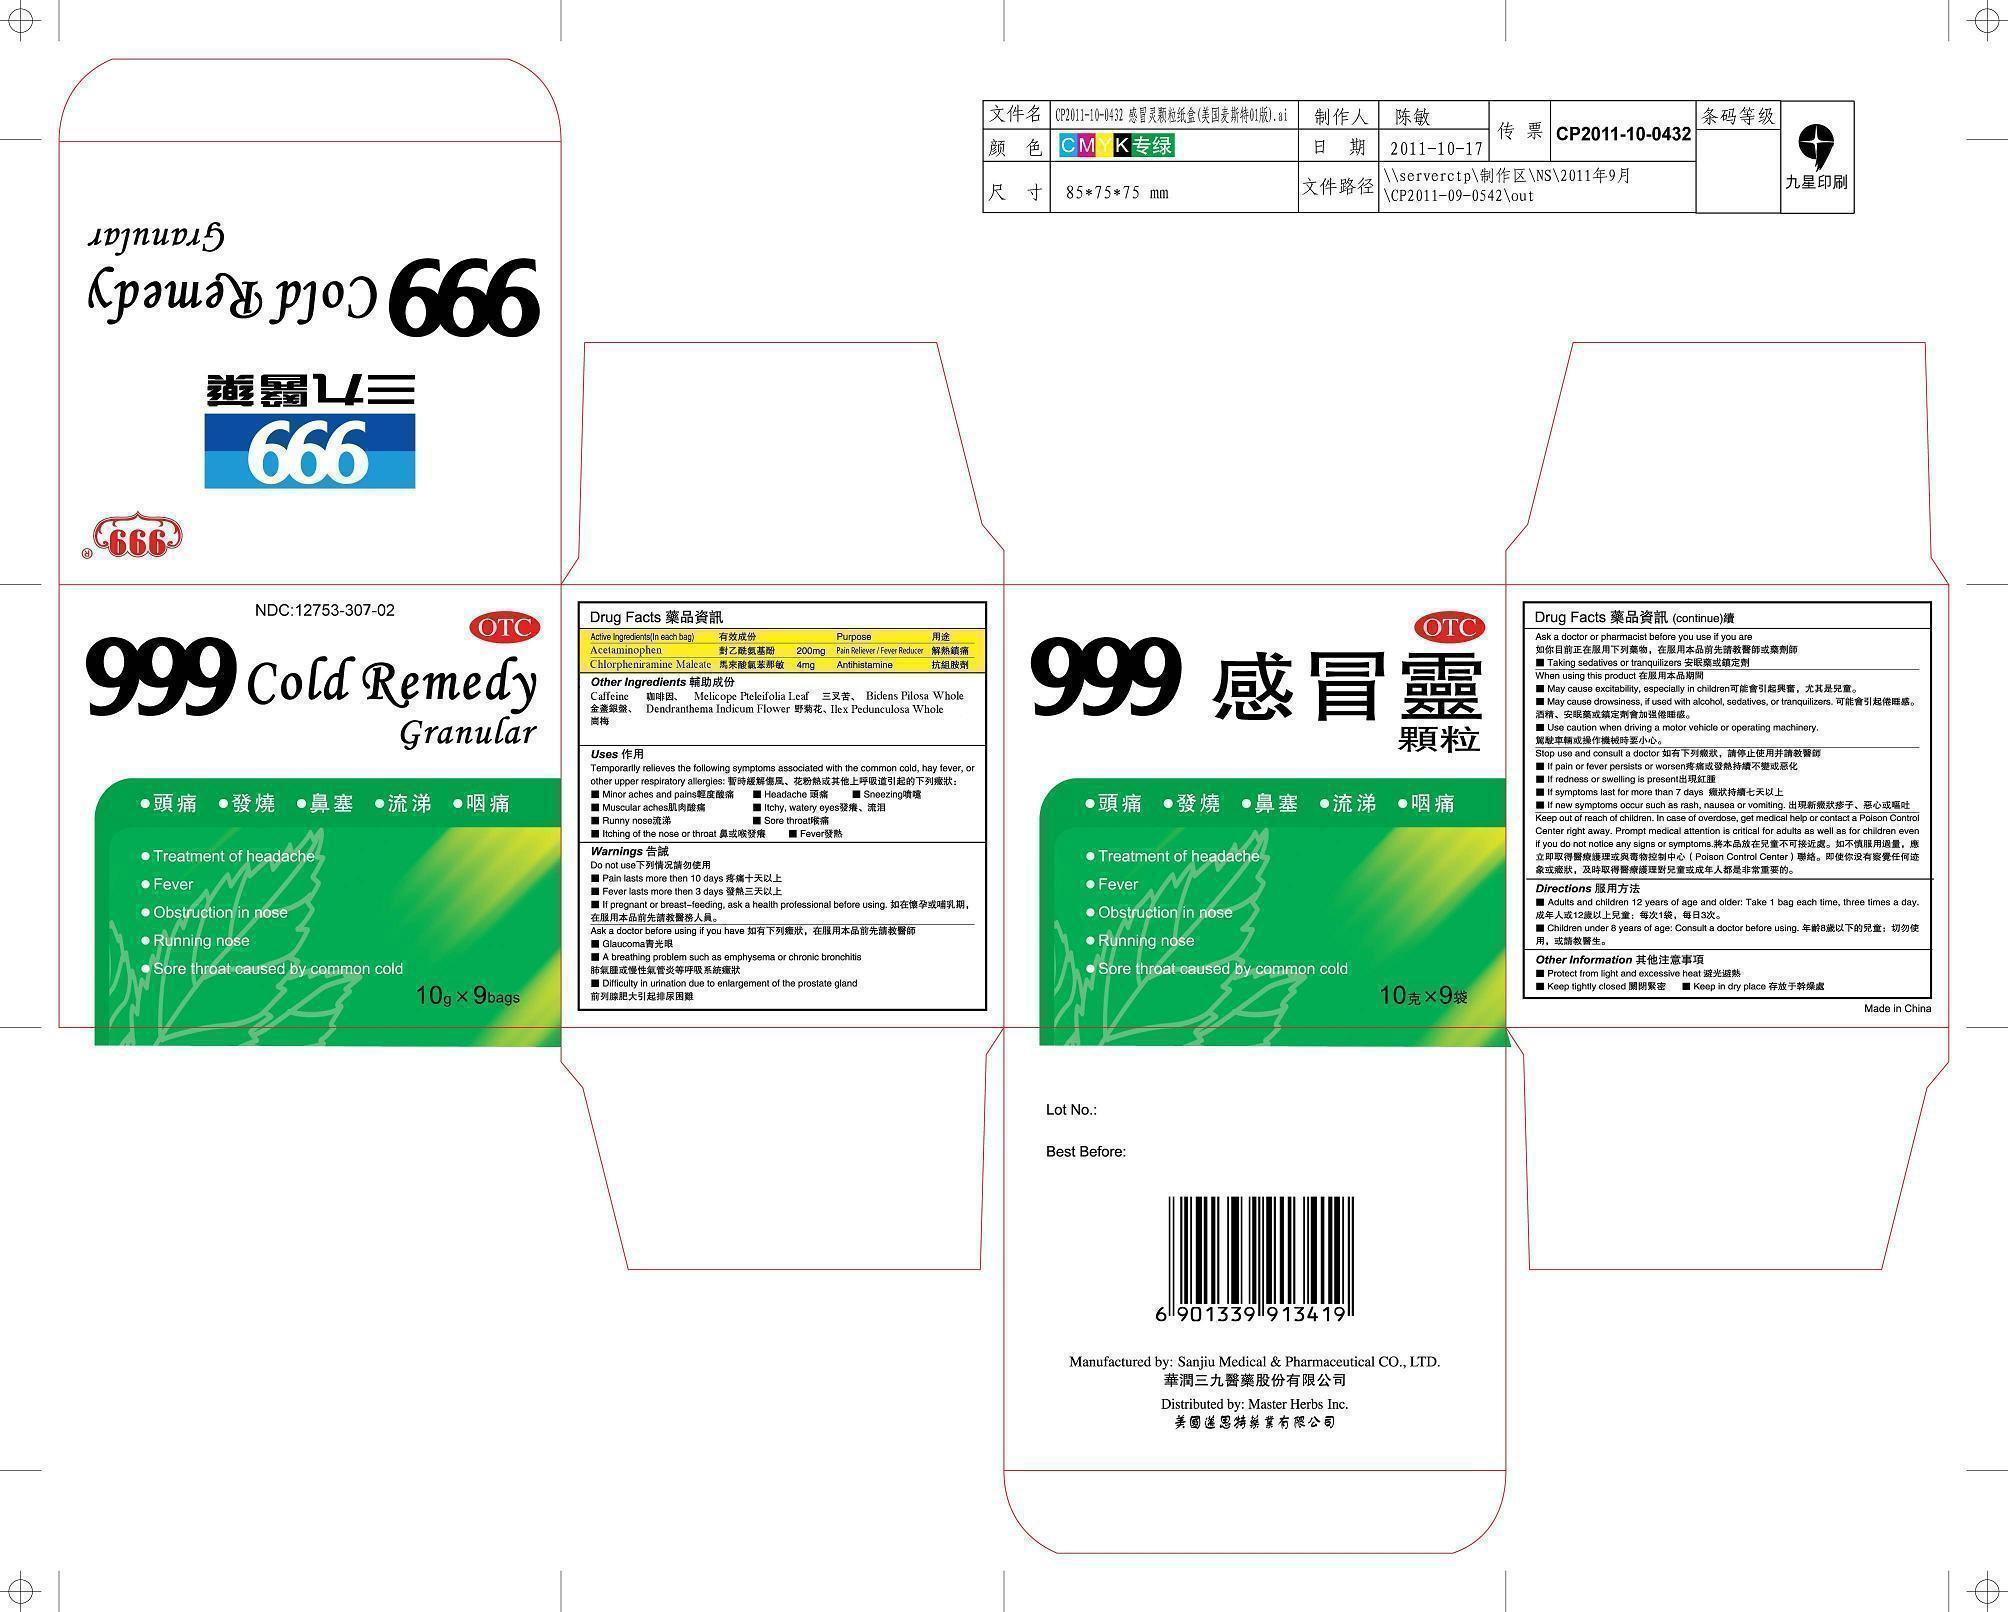 999 Cold Remedy Granular (Acetaminophen, Chlorpheniramine Maleate) Granule [China Resources Sanjiu Medical & Pharmaceutical Co Ltd]